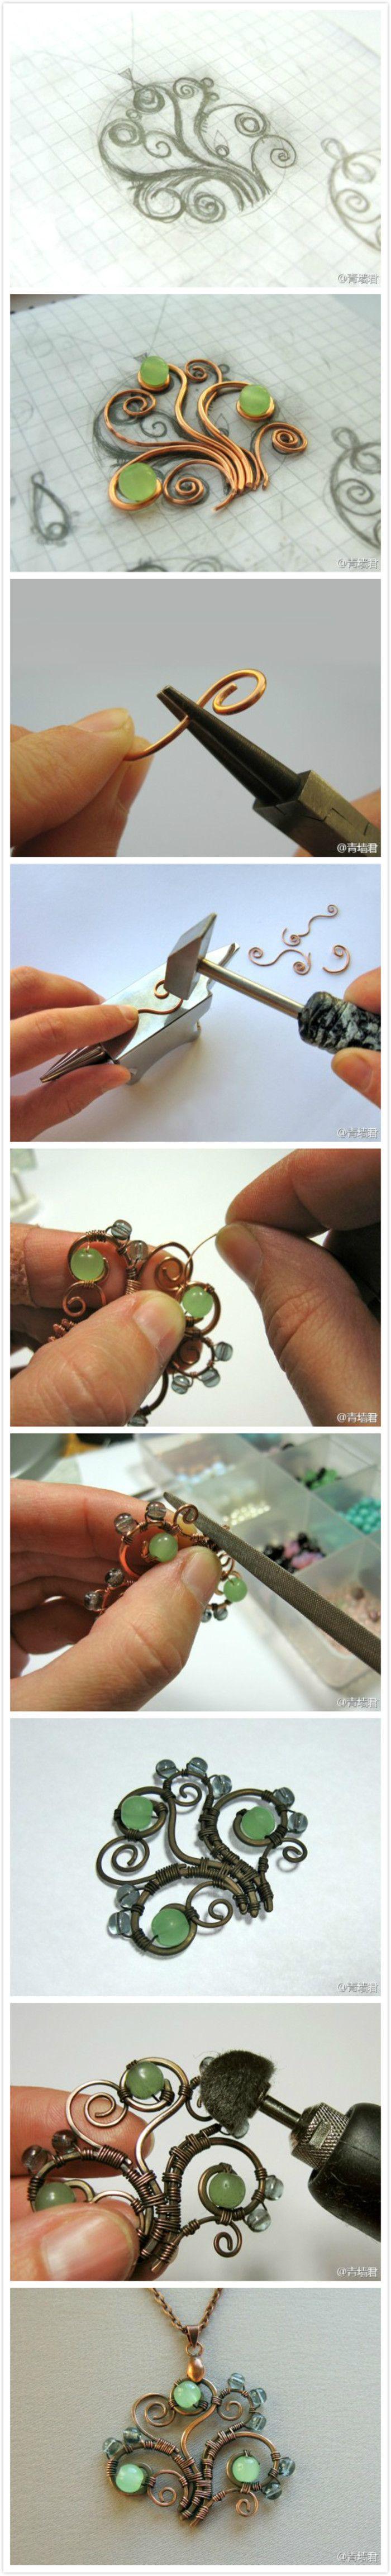 design steps for ornate jewellery pendant 6464